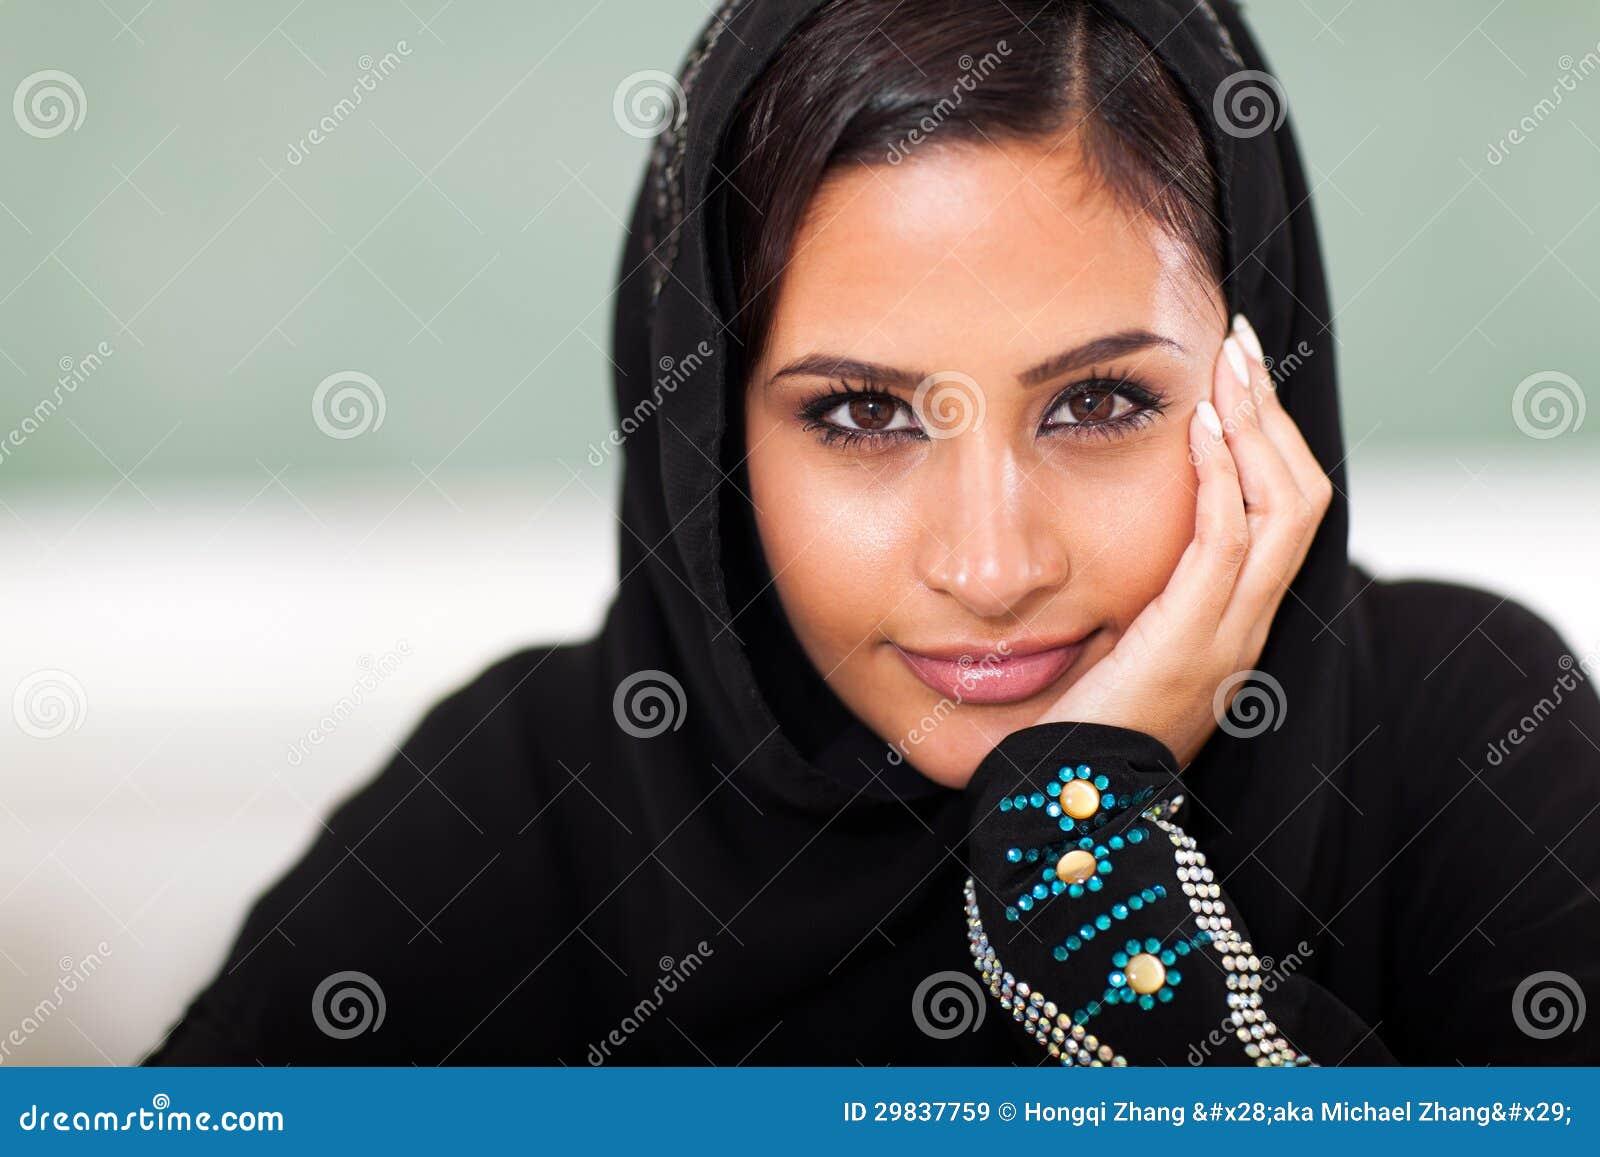 Muslim Teen Pic 44